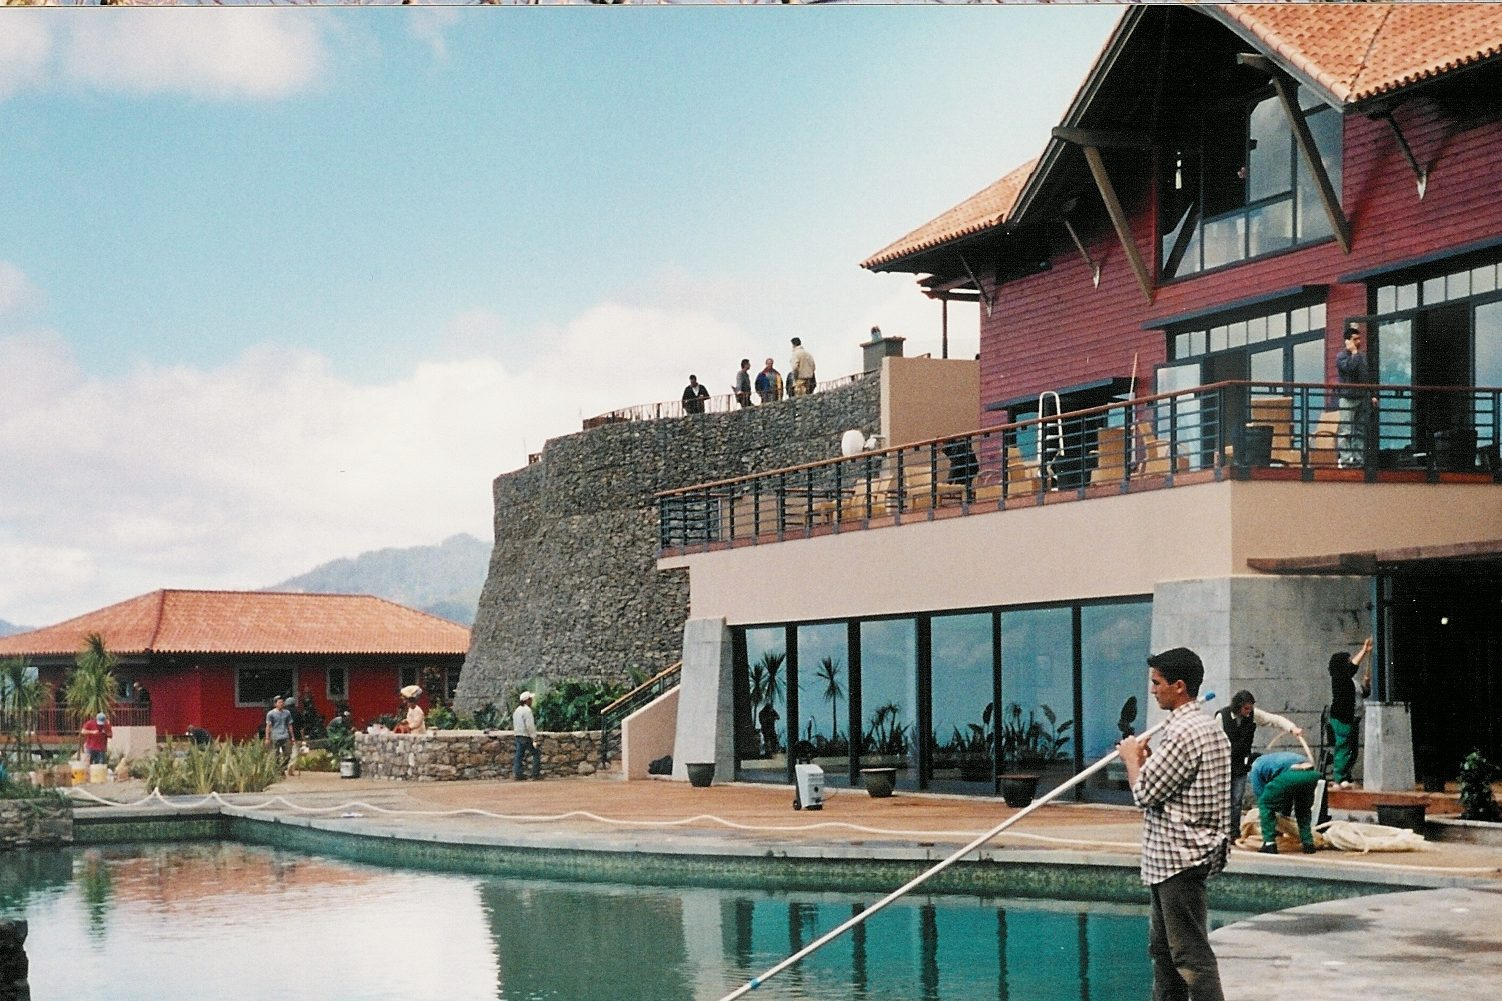 madere-portugal_choupana-hills-resort_satob-cb_2003-127